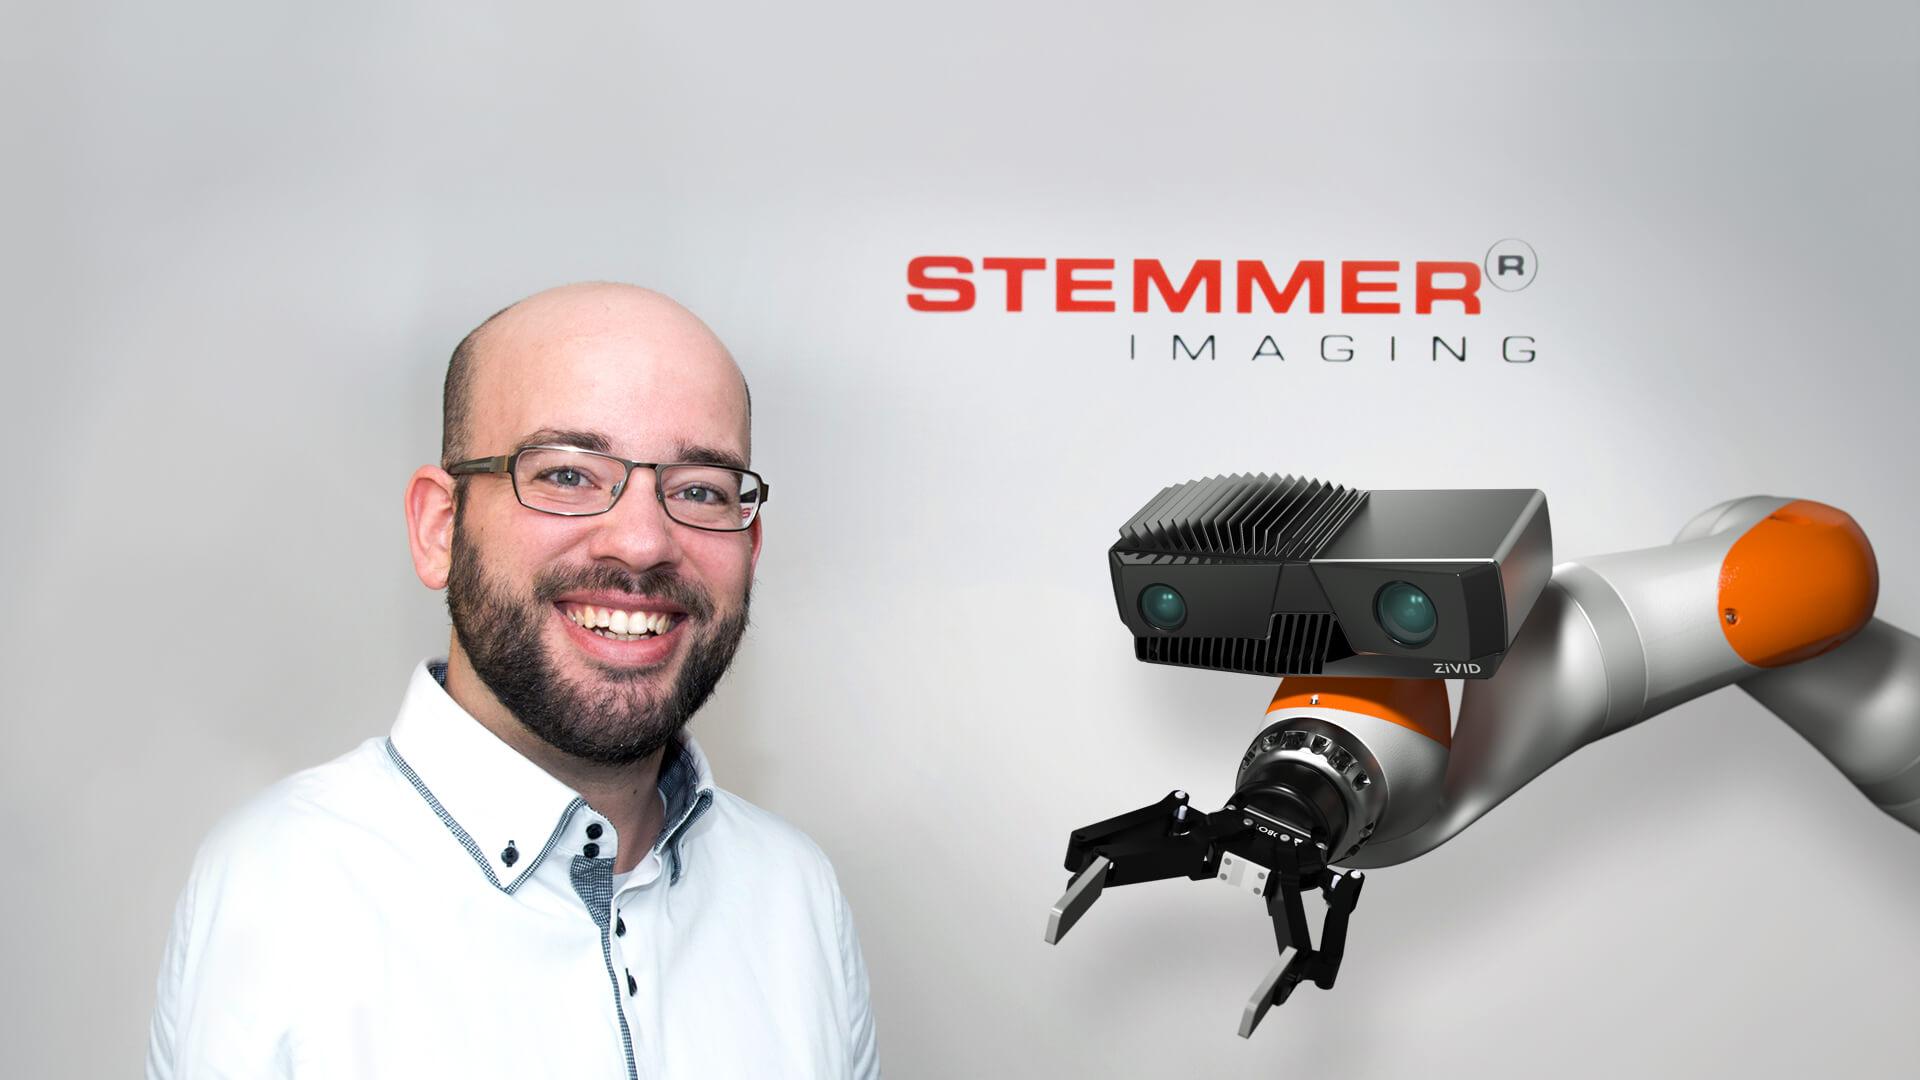 Stemmer Imaging - Zivid 3D